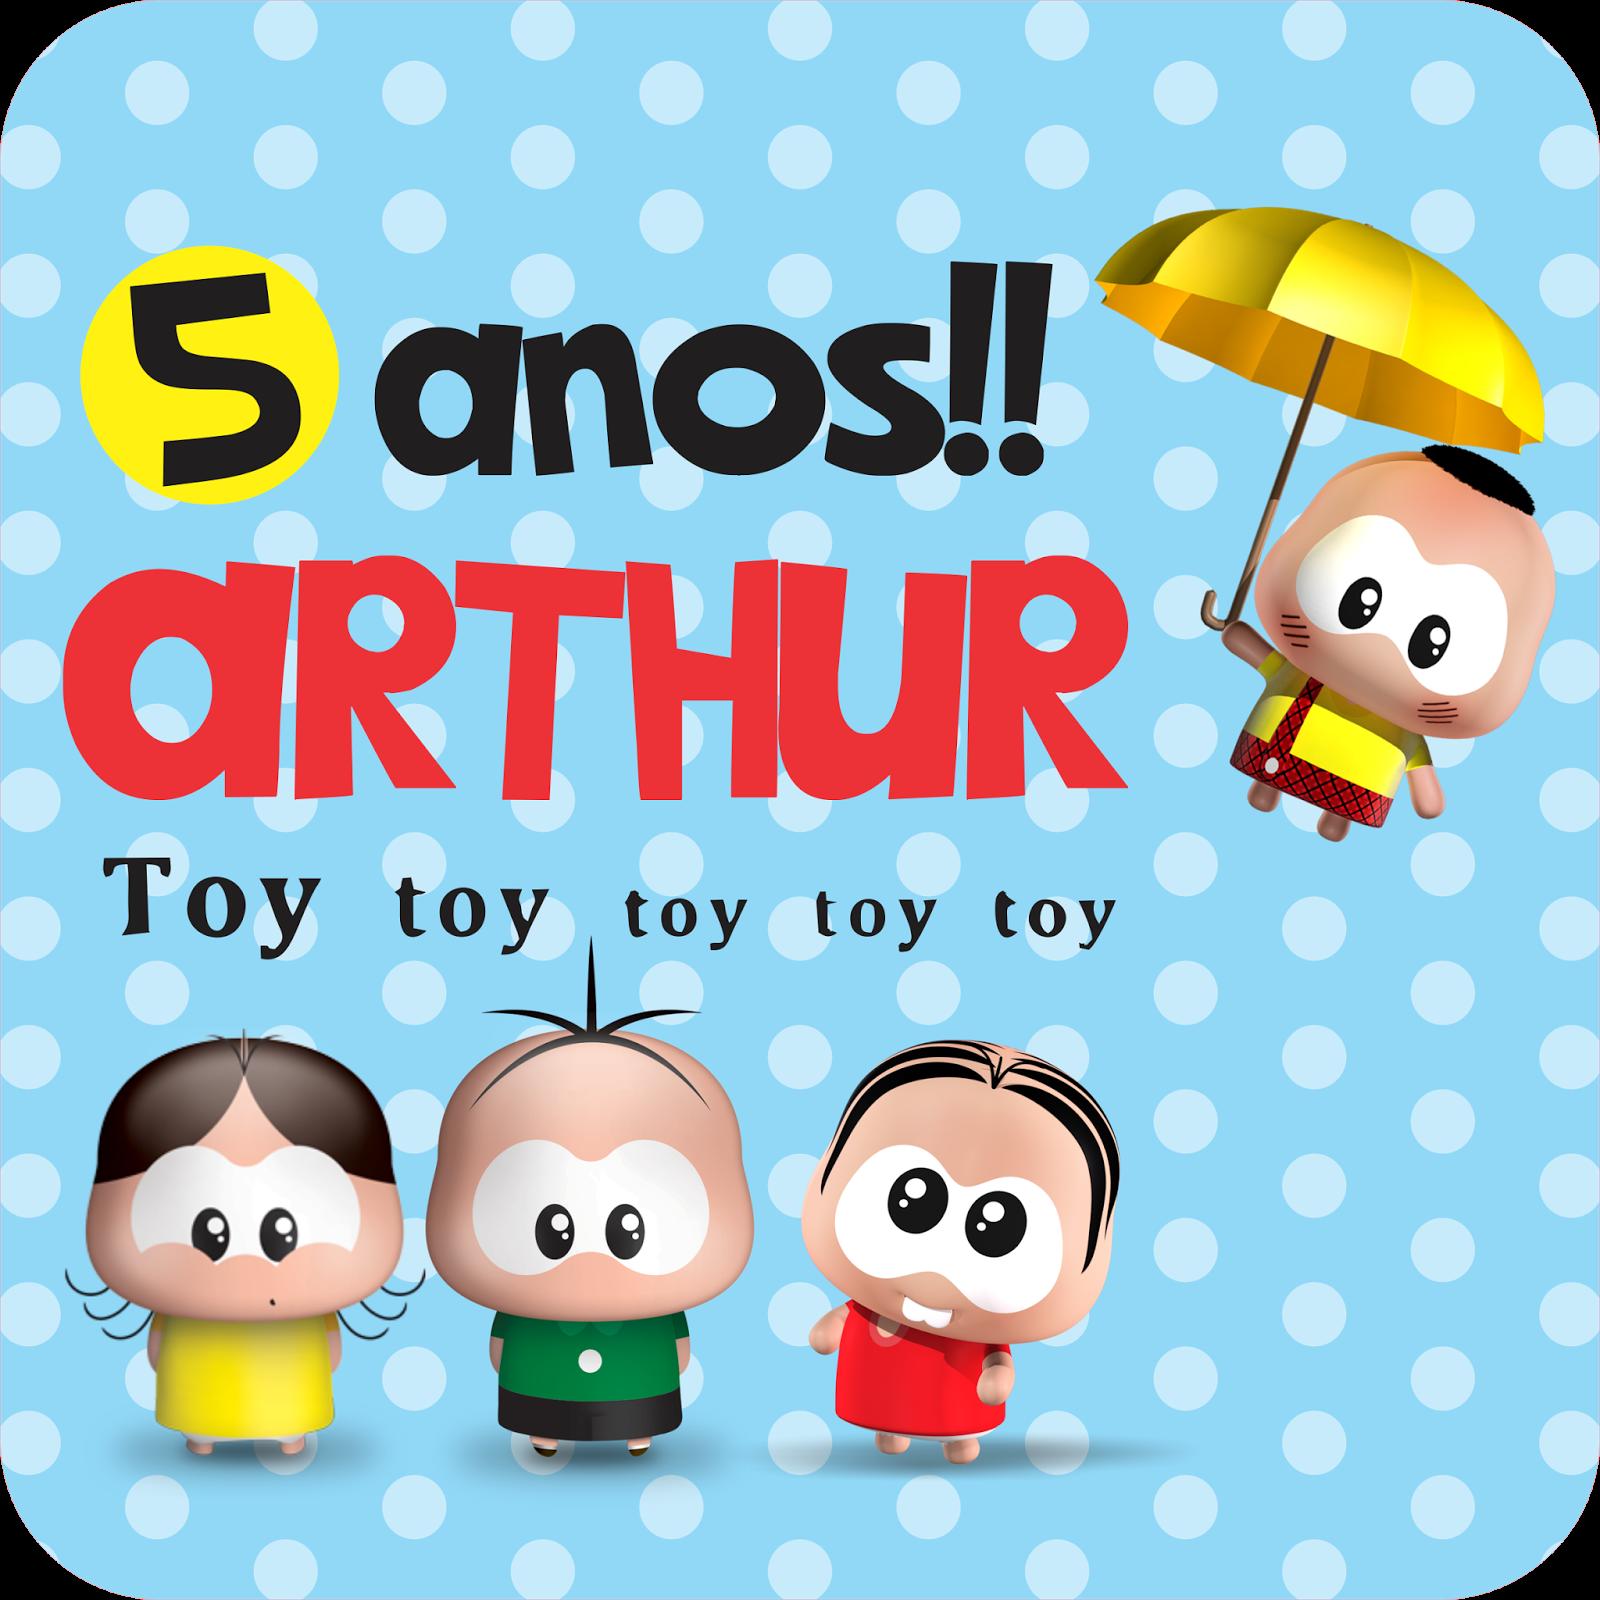 https://fruipartis.blogspot.com.br/2017/03/monica-toy-arthur.html